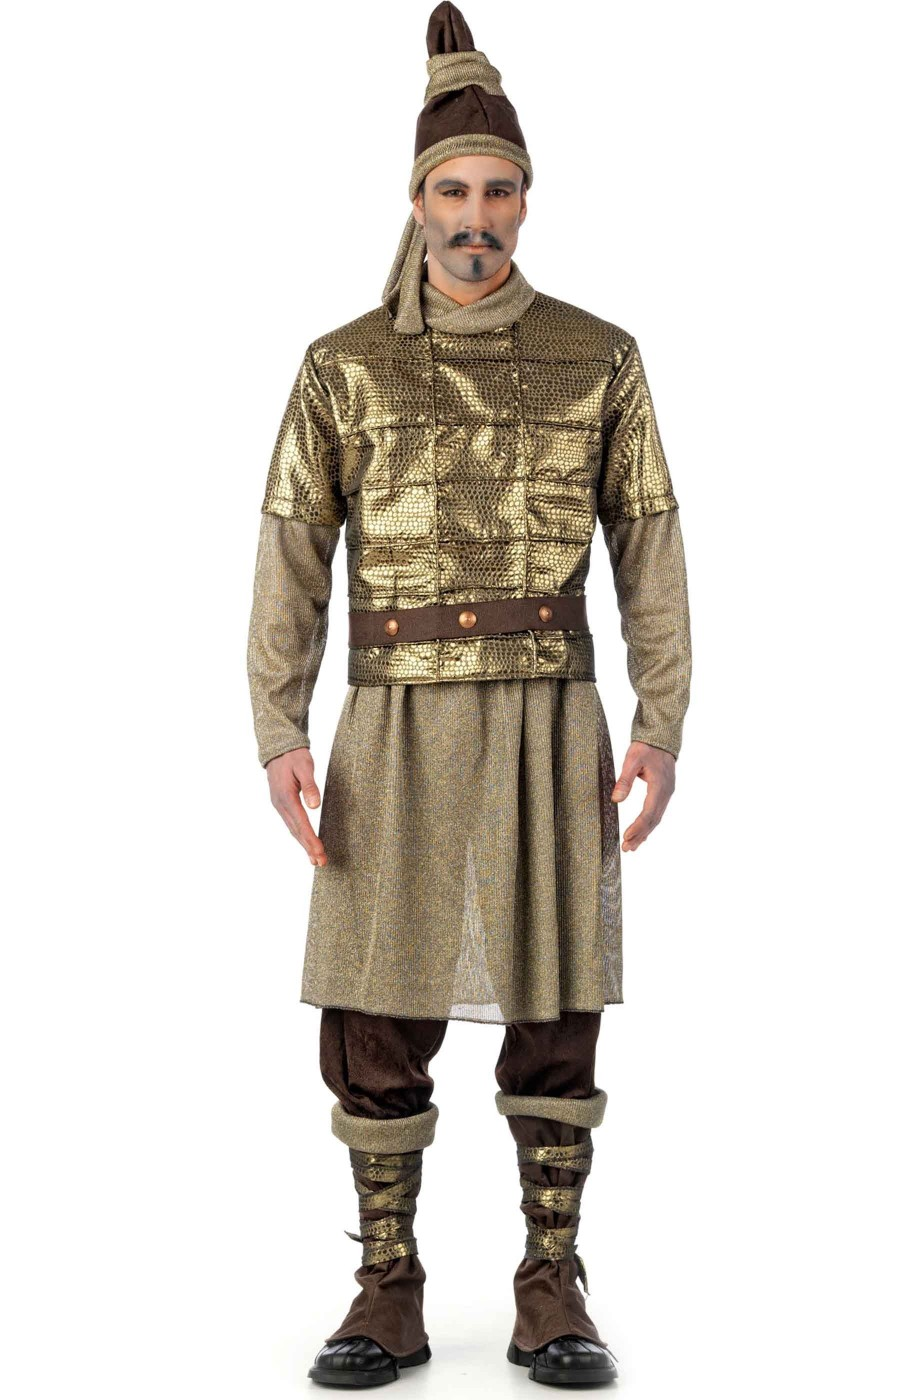 Costume uomo guerriero cinese esercito di terracotta. Qualita' teatrale.